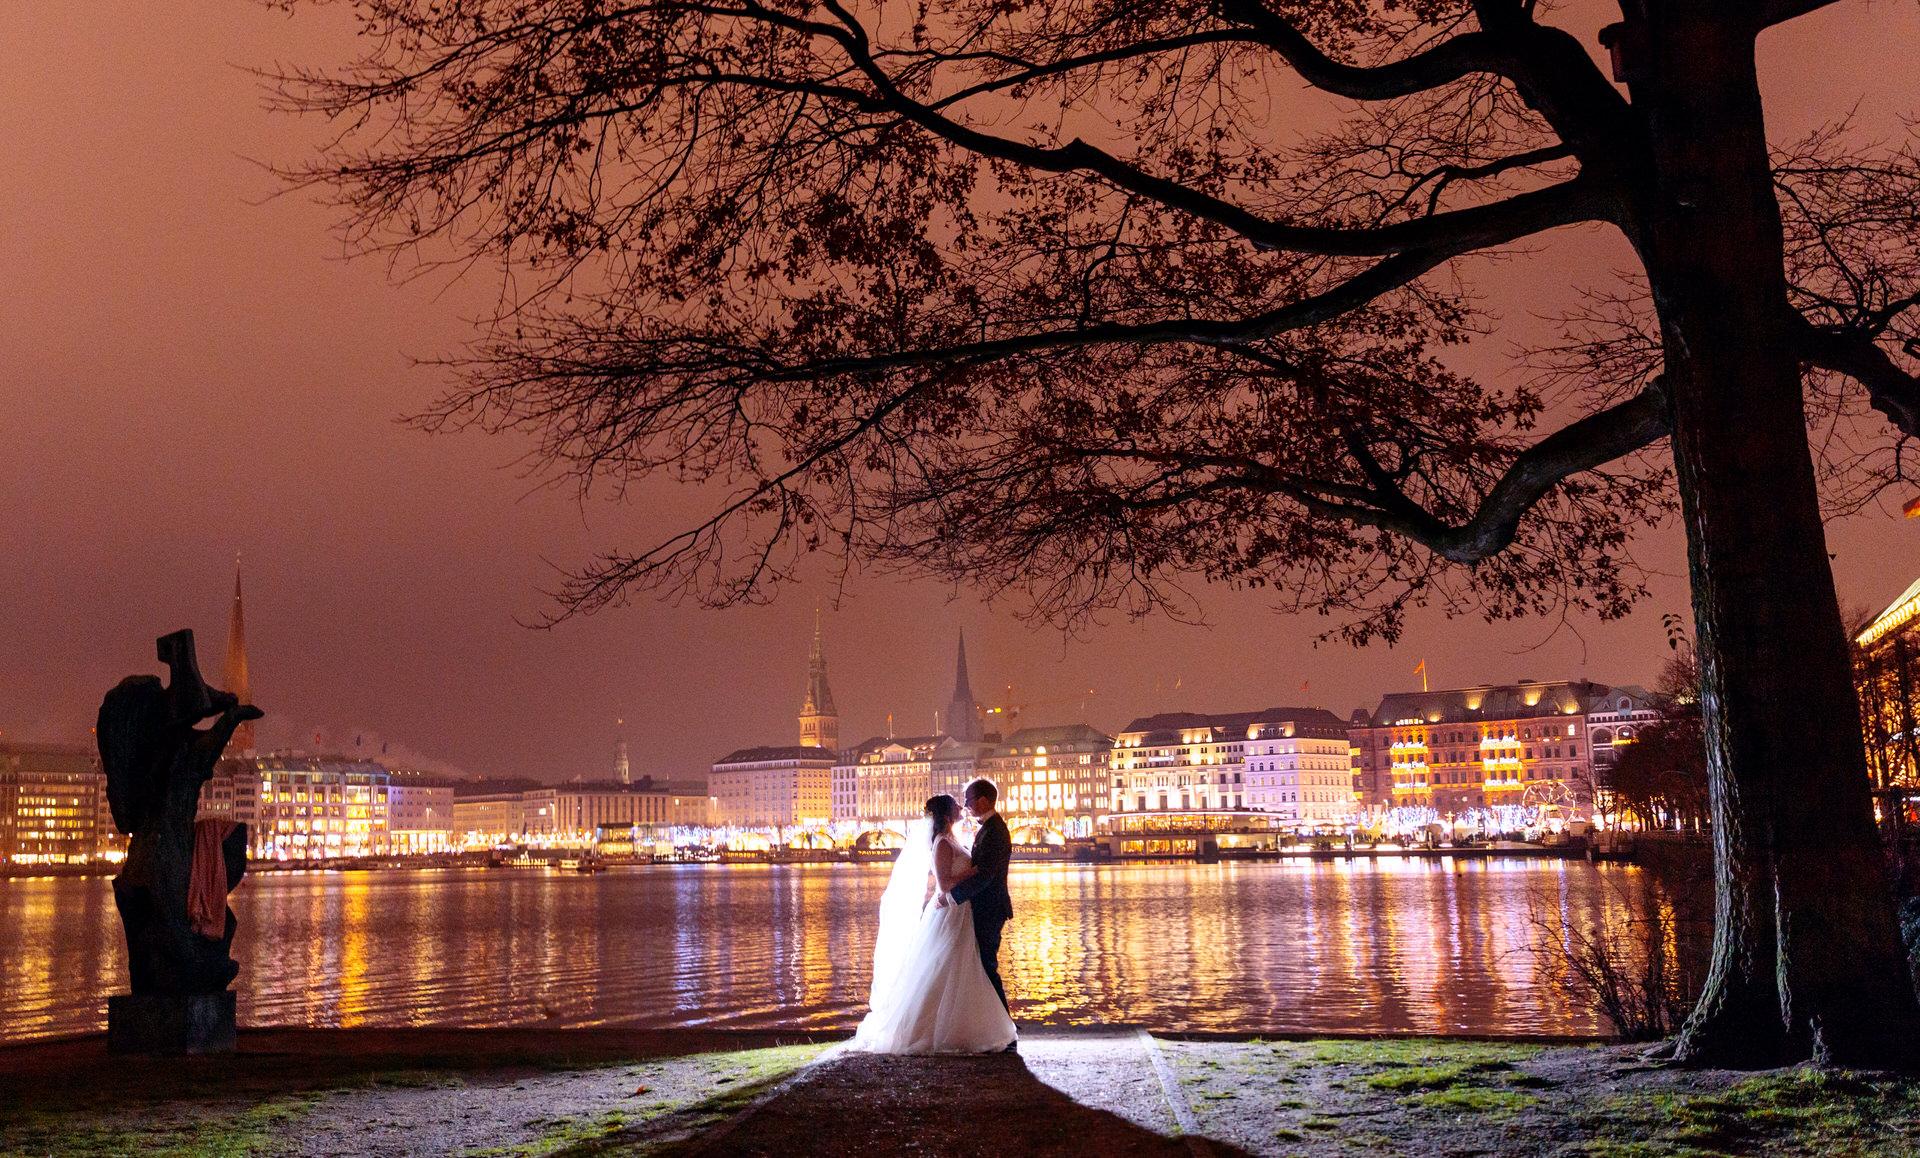 Brautpaar am Abend an der Binnenalster in Hamburg